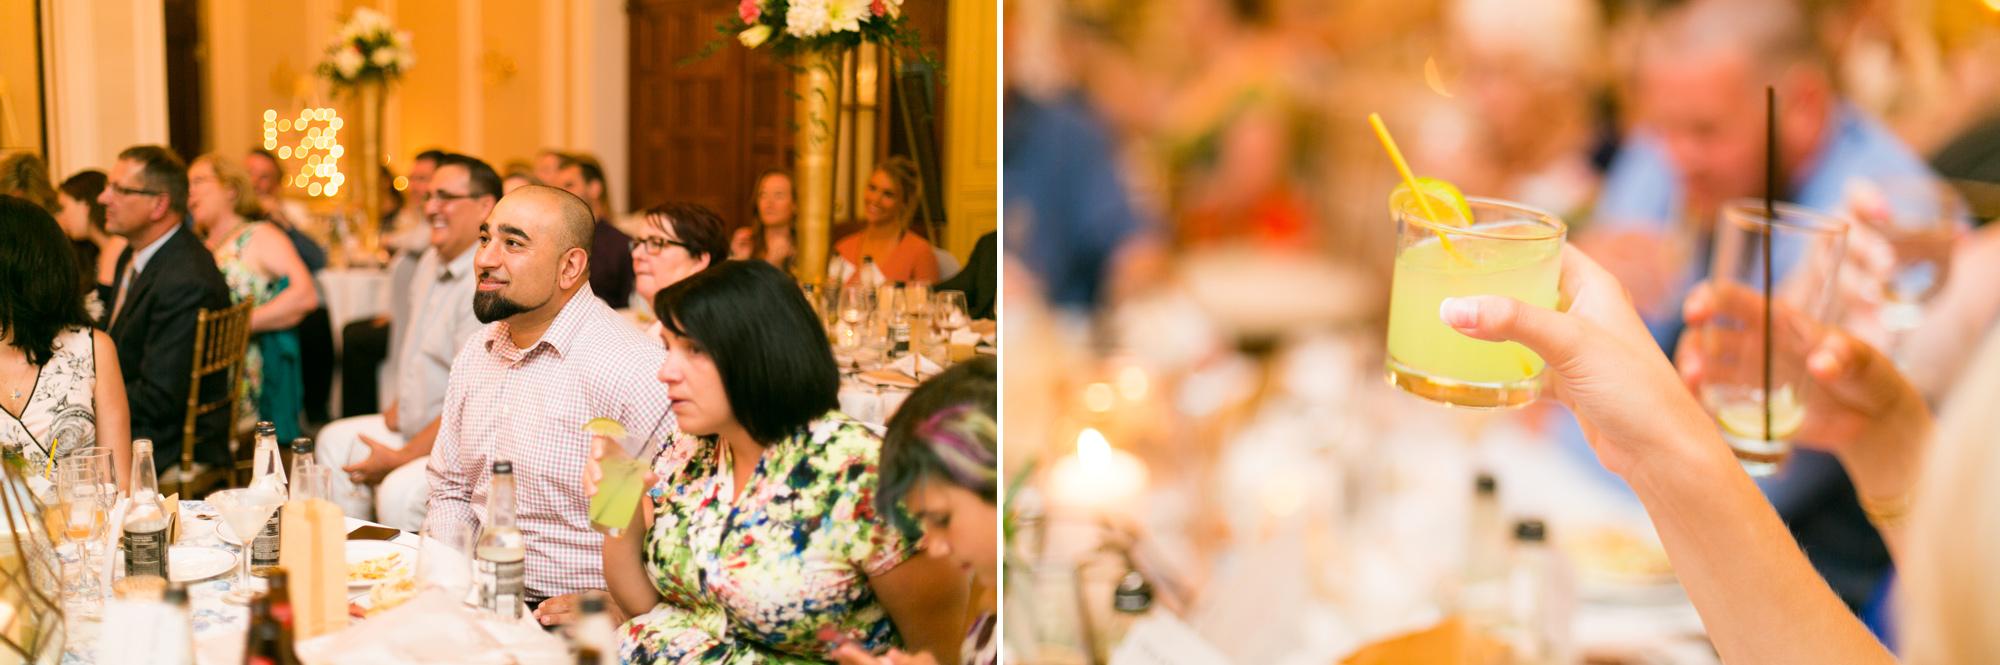 126-lord-nelson-wedding------.jpg